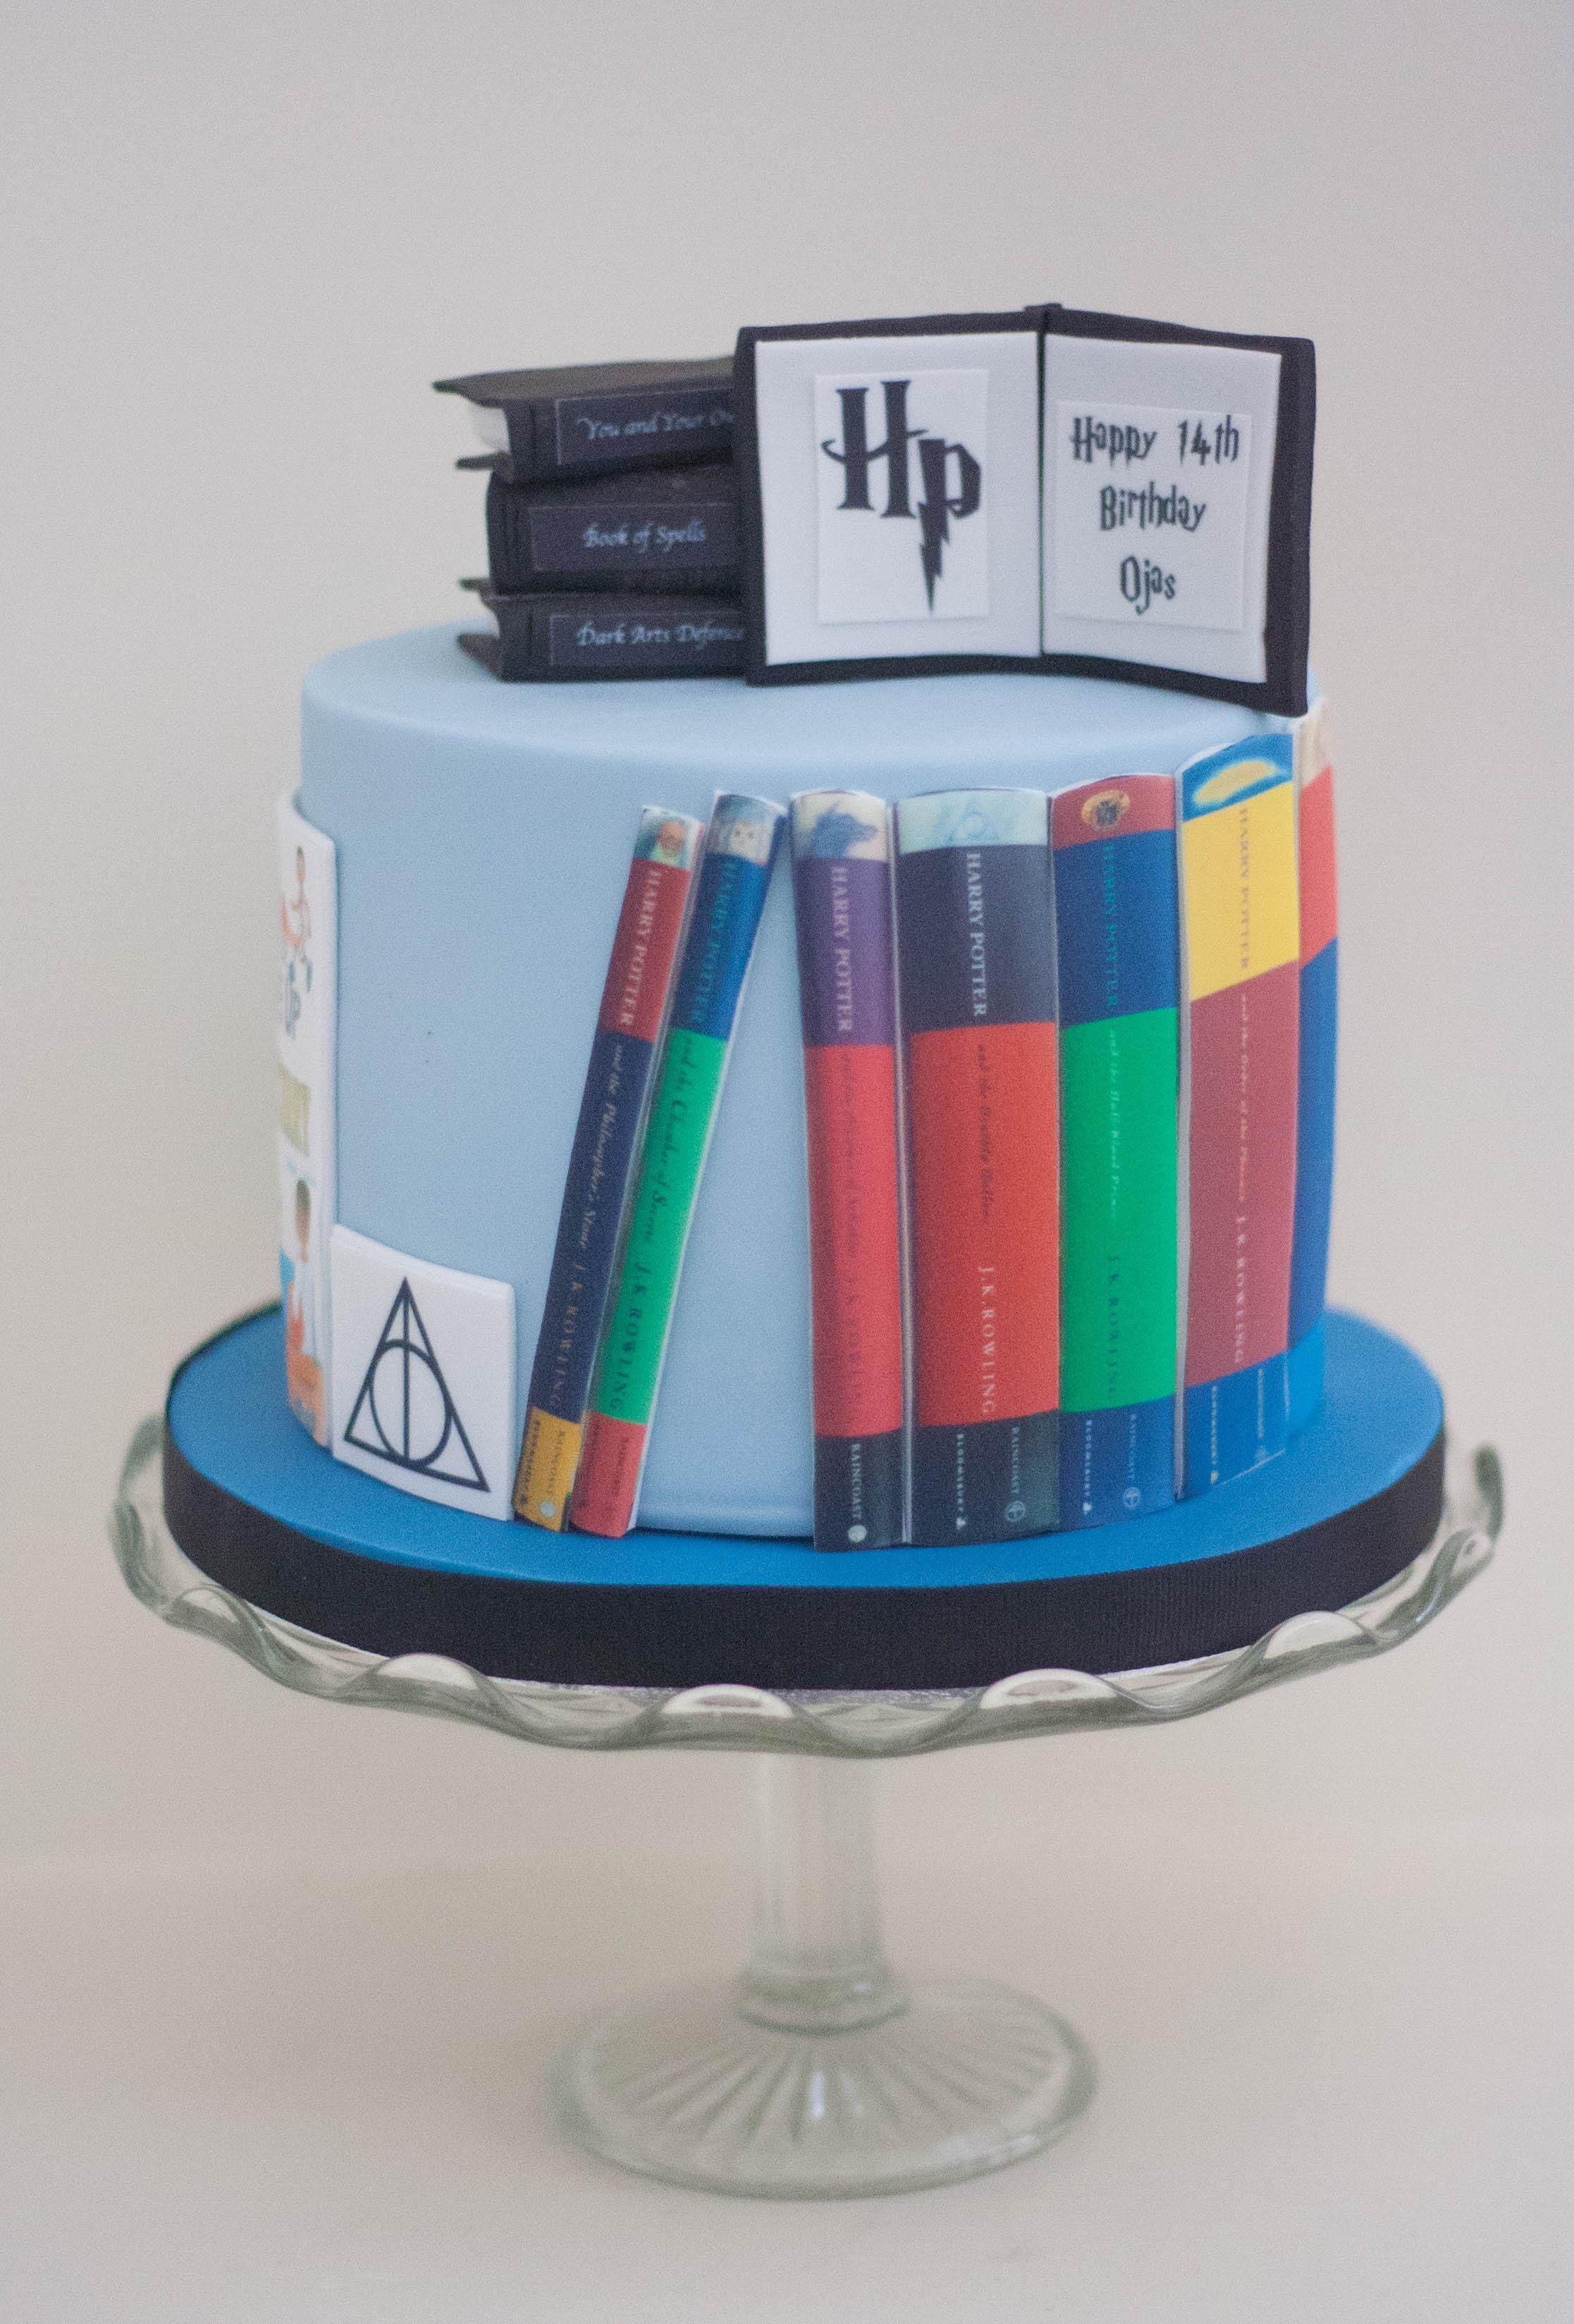 Harry Potter books vegan cake